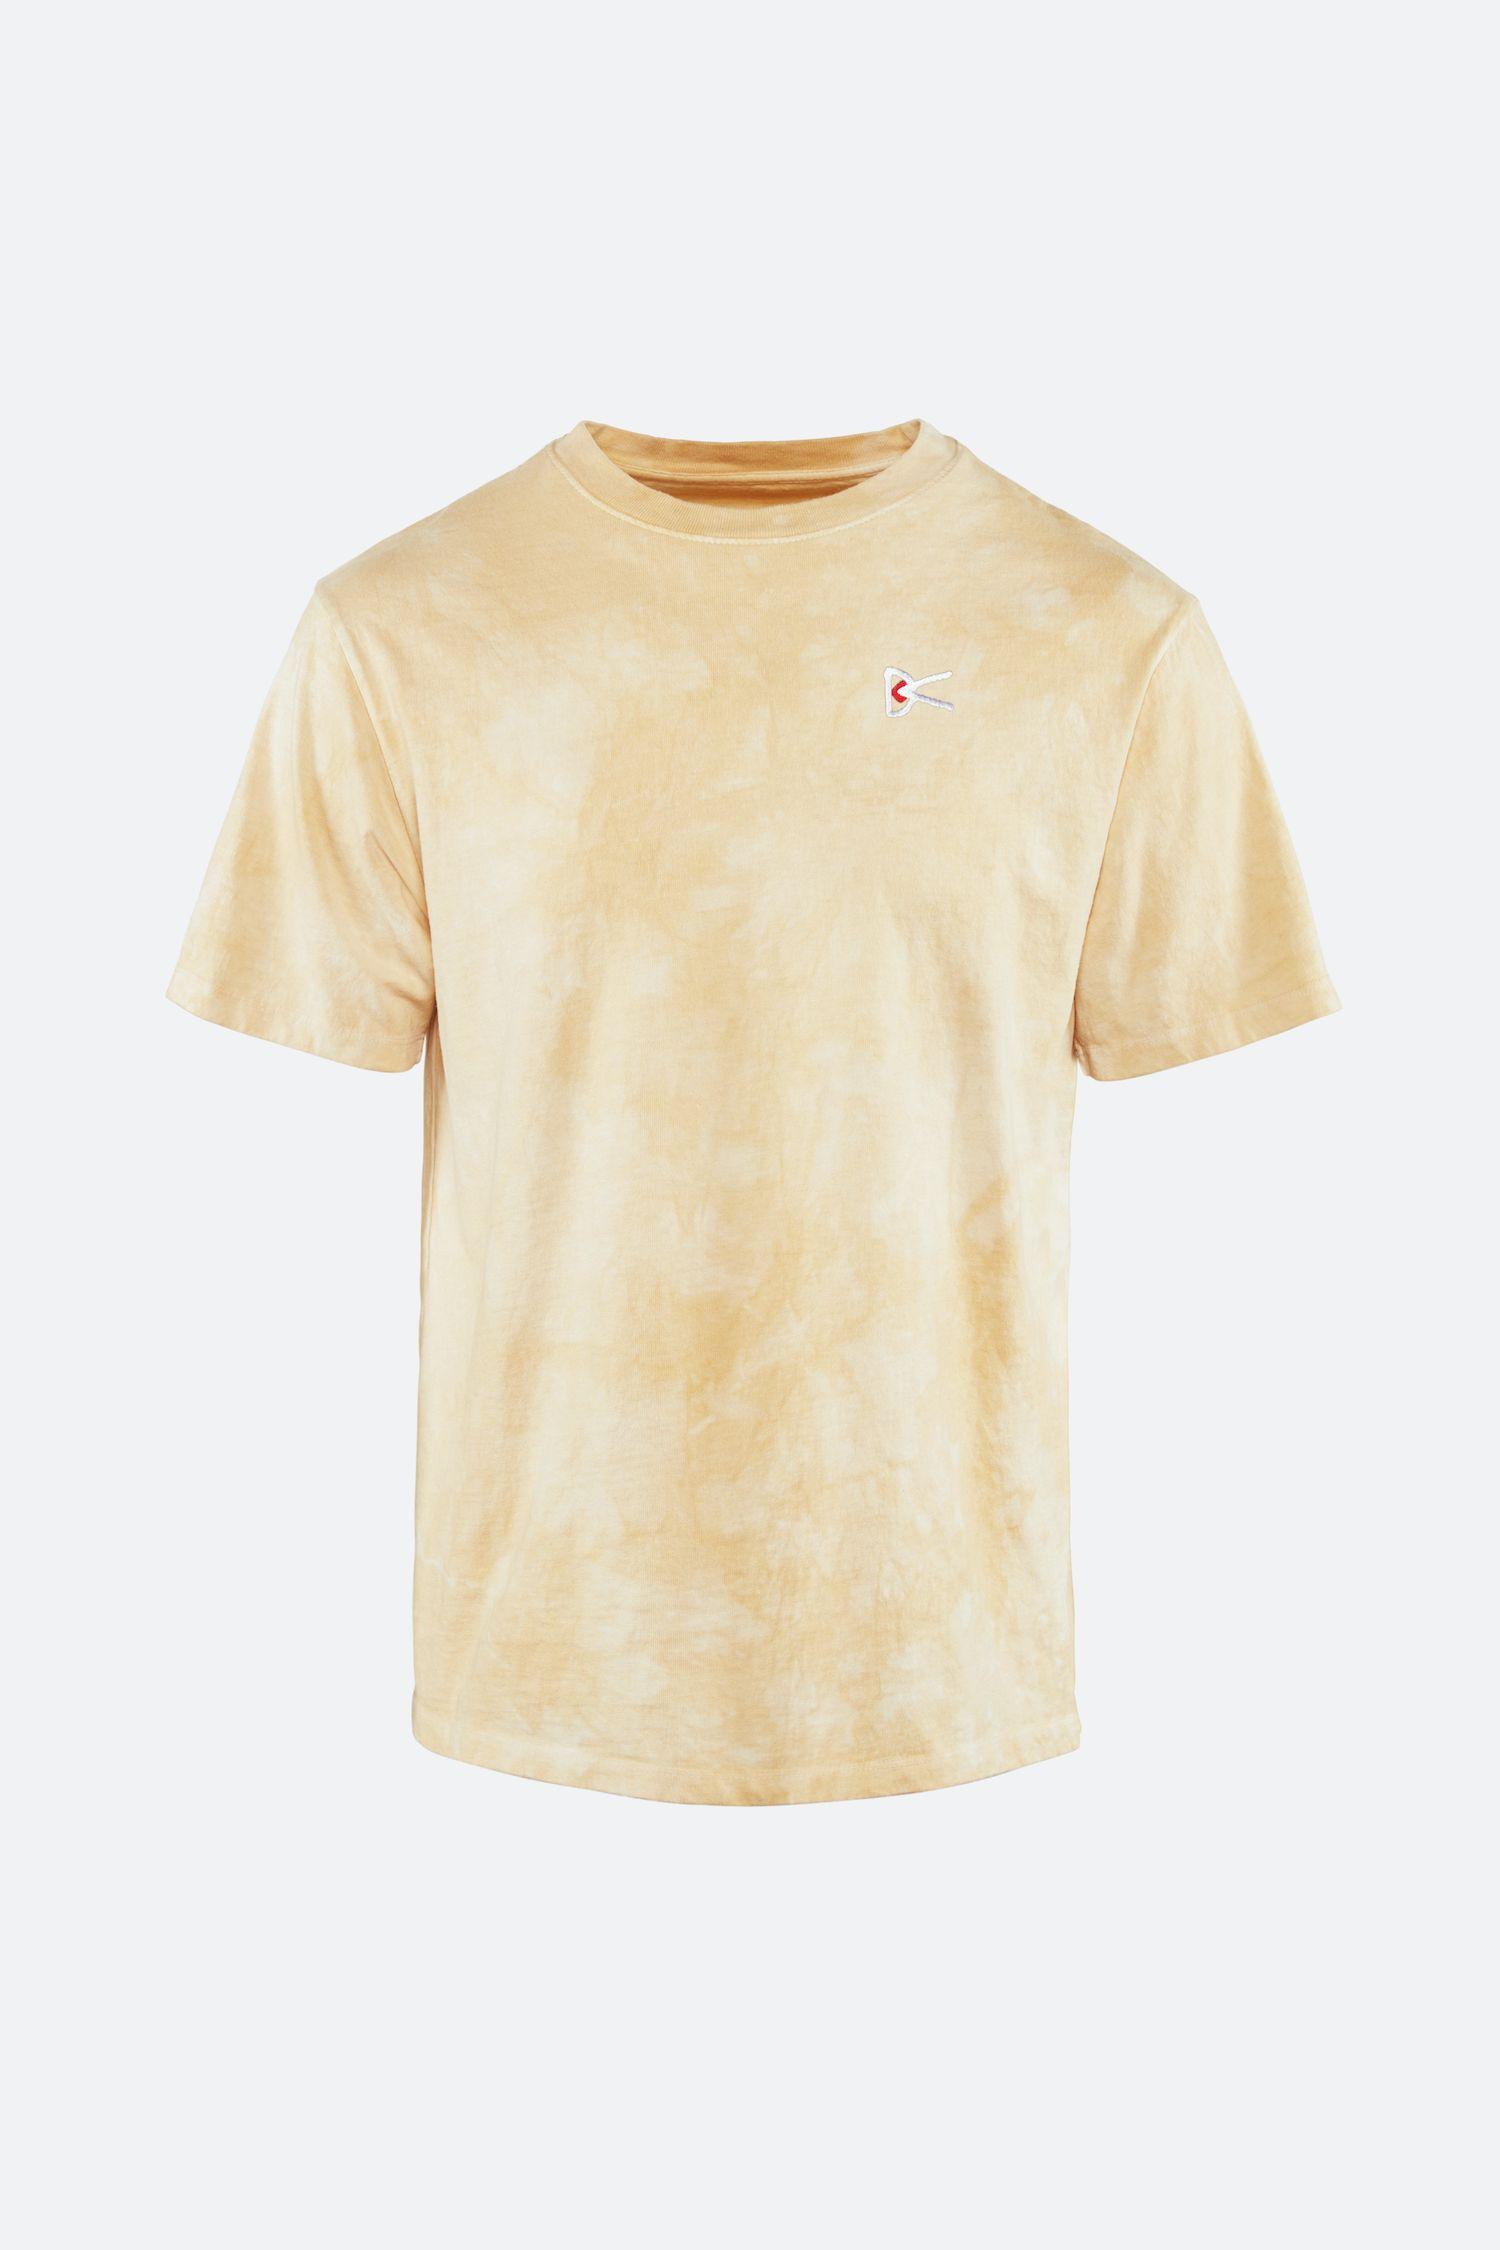 Karuna Short Sleeve T-Shirt, Mr. Porter